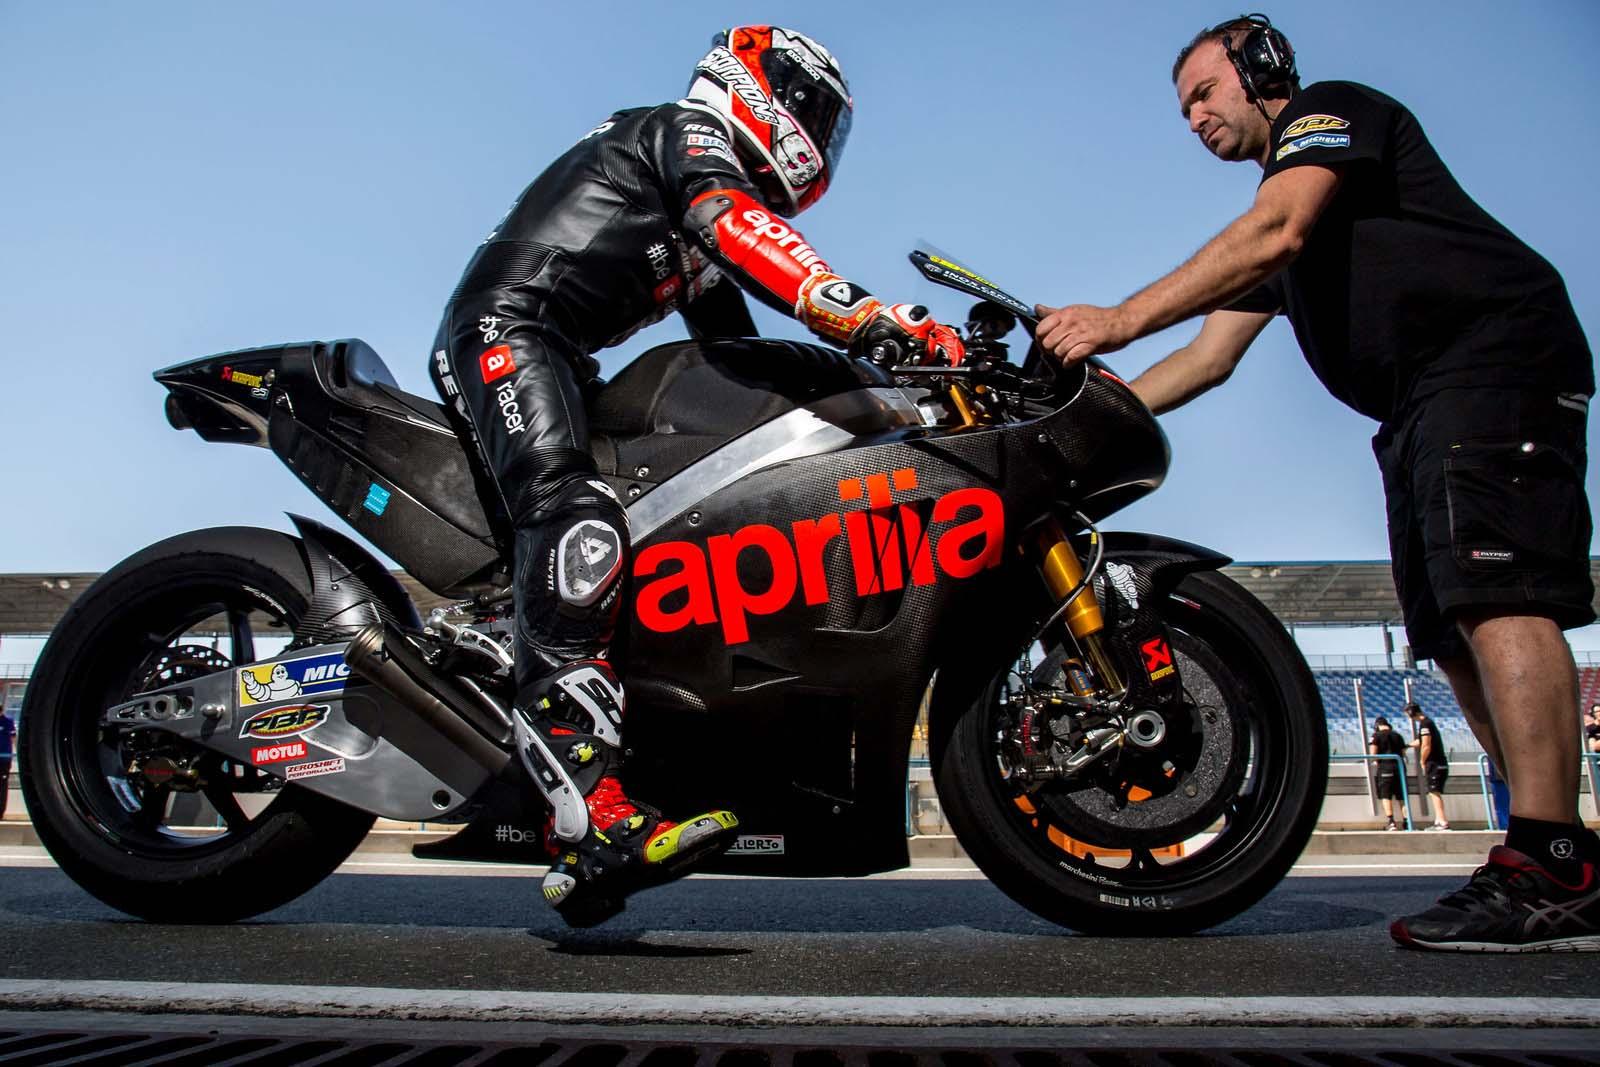 Aprilia Racing Team Gresini Reveals the All-New RS-GP Bike